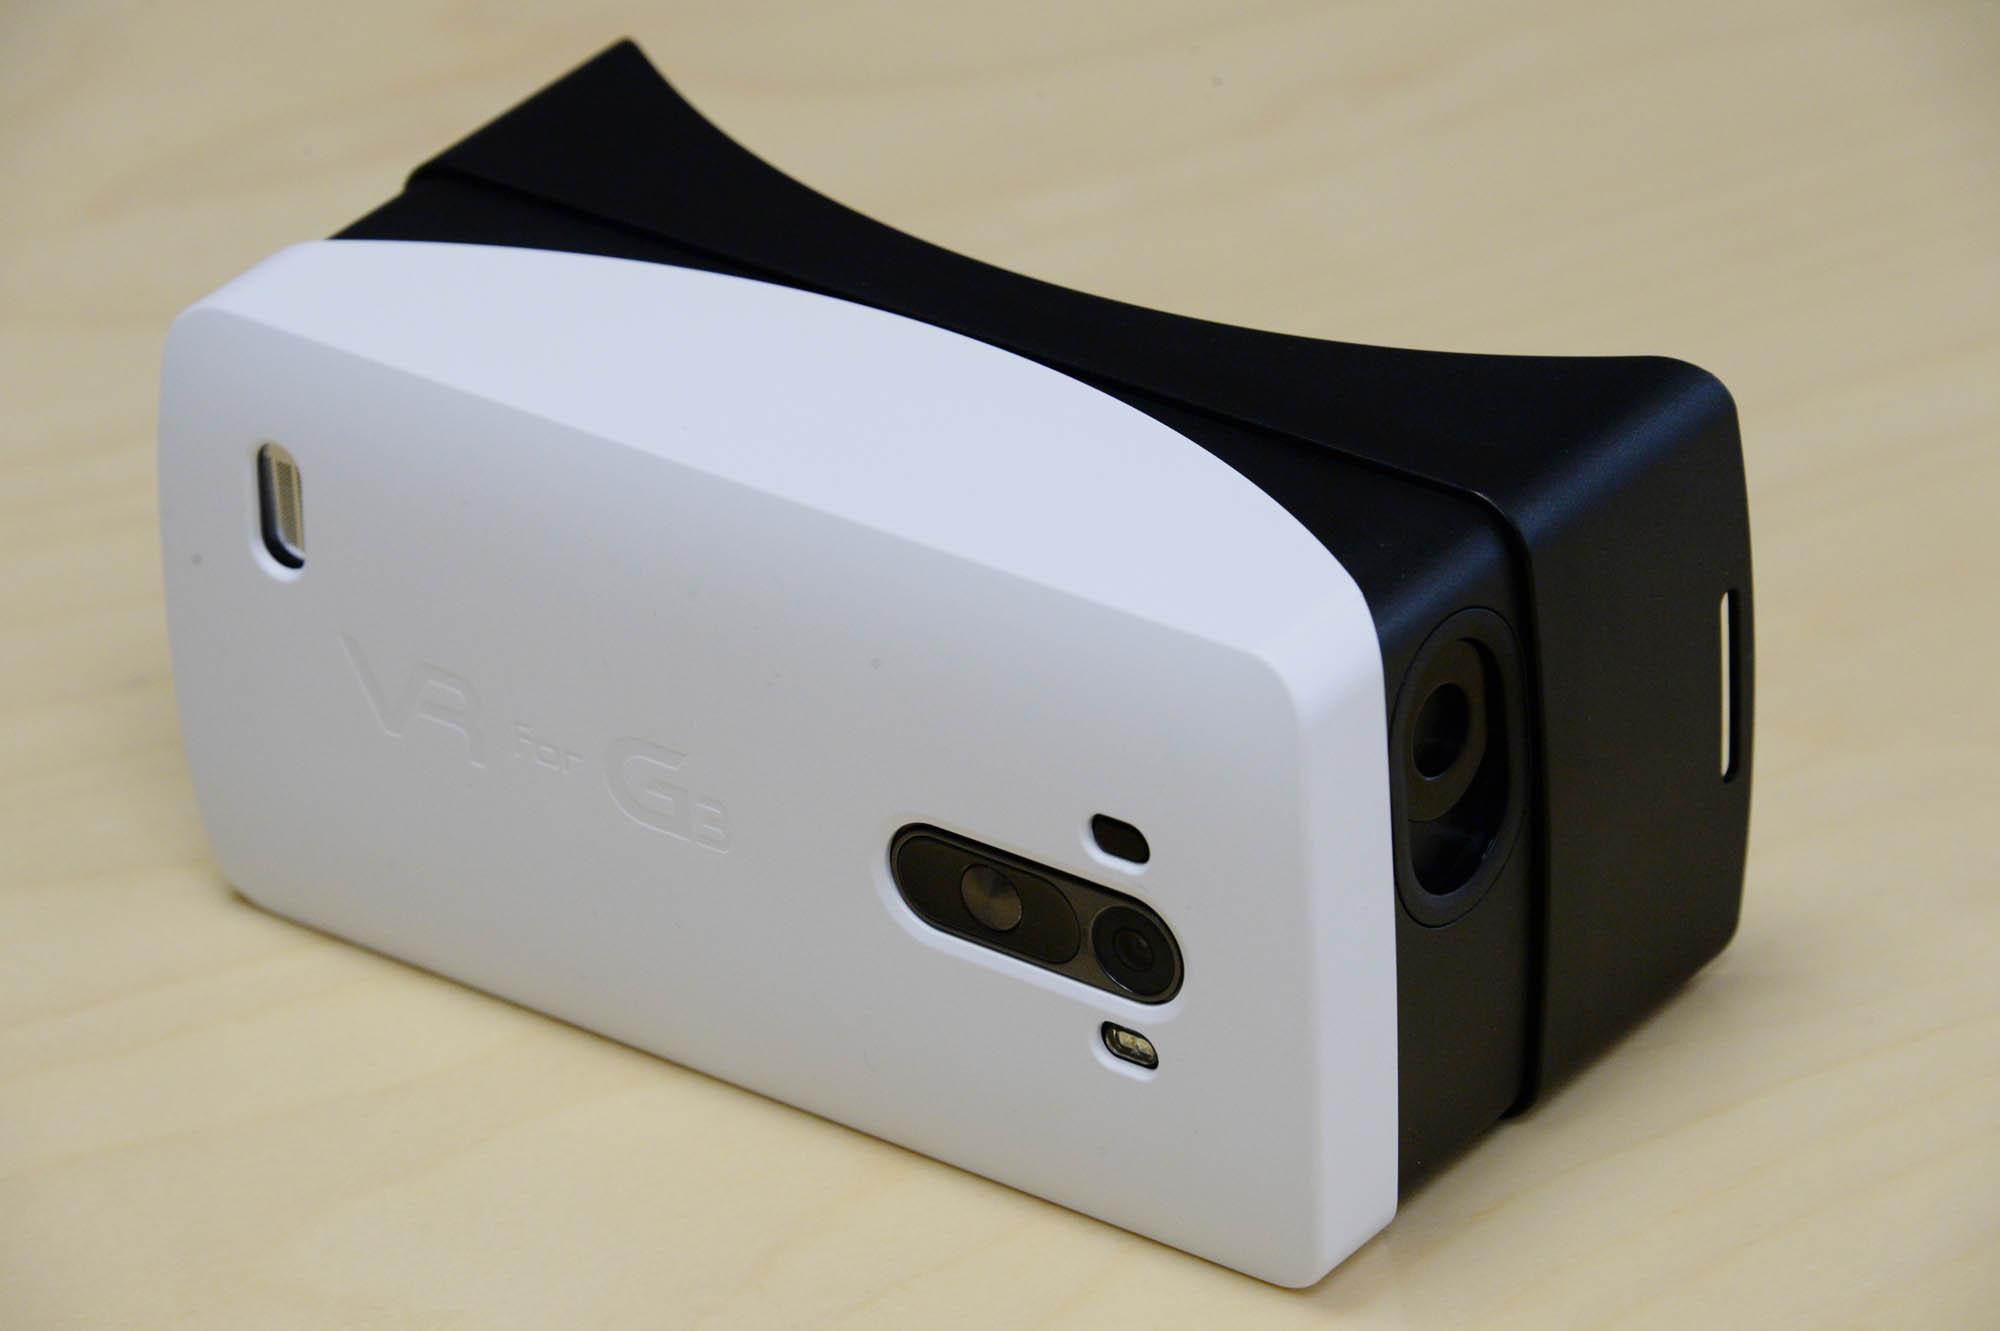 LG G3 AND GOOGLE CARDBOARD - VIRTUAL REALITY - IMAGE 2